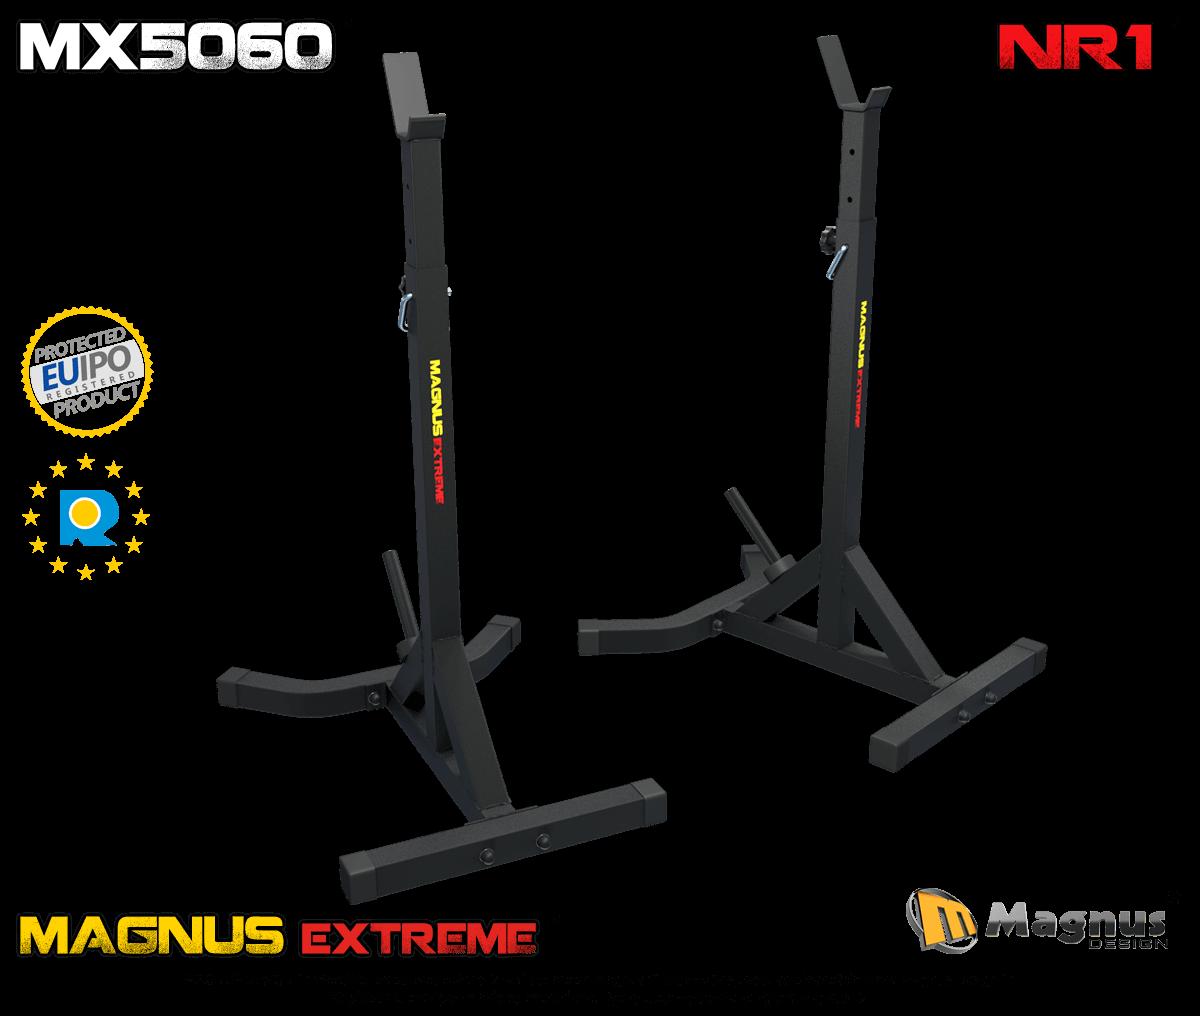 Stojaki treningowe pod sztangę Magnus Extreme MX5060